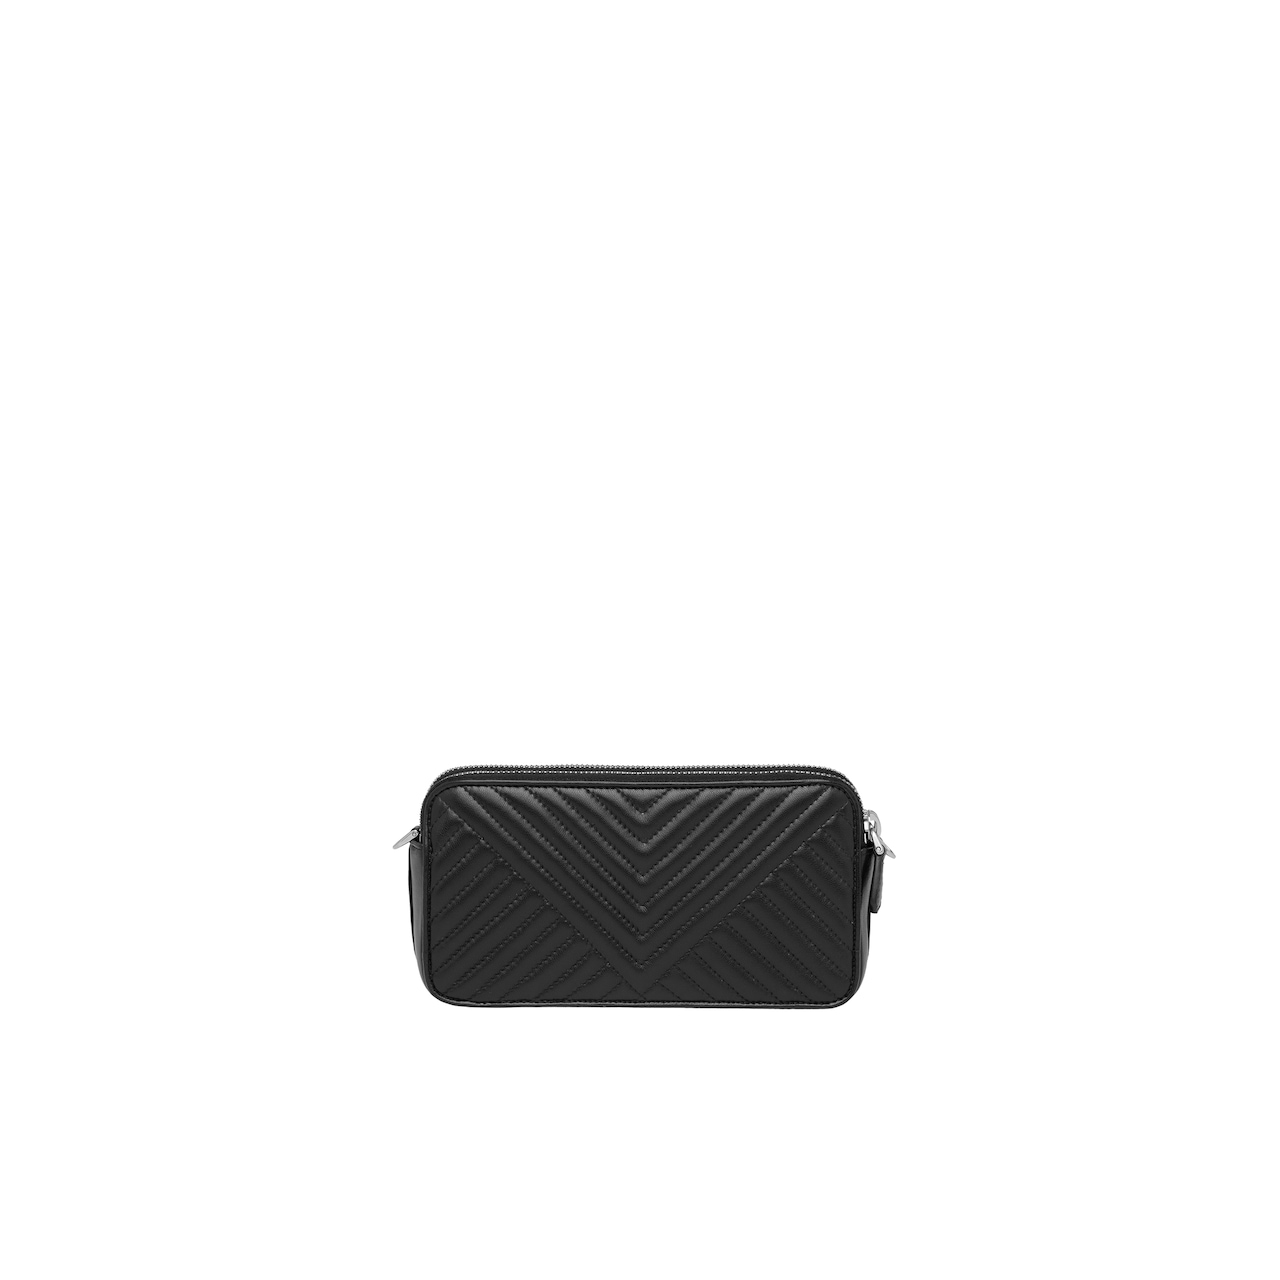 Nappa leather mini shoulder bag